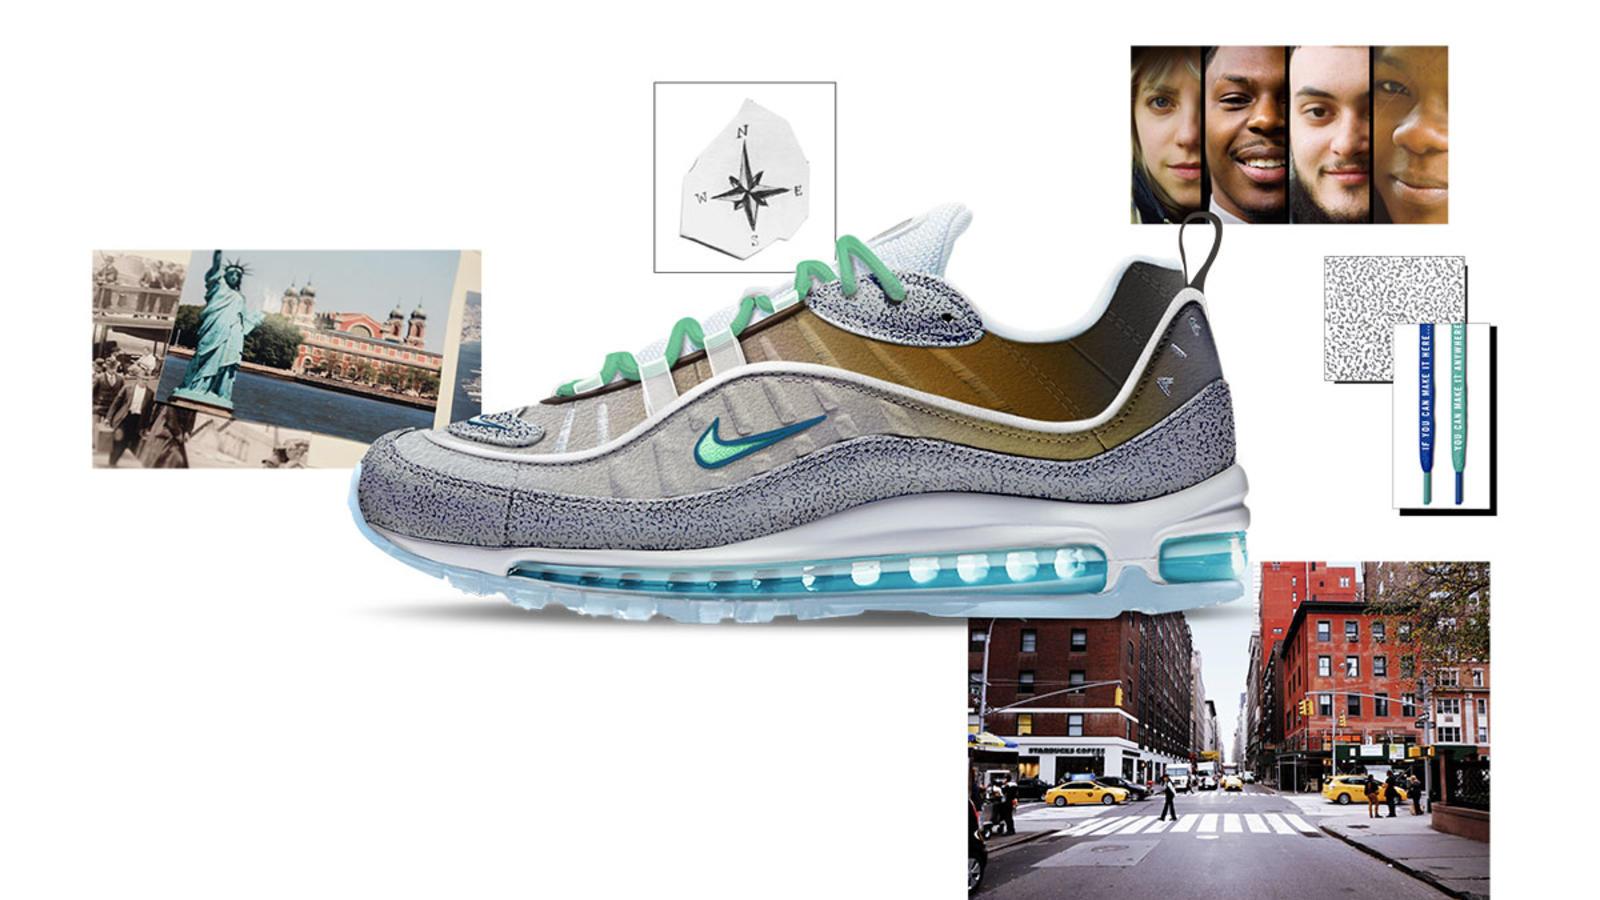 NYC-MixingPot_FINAL-01_re_hd_1600.jpg